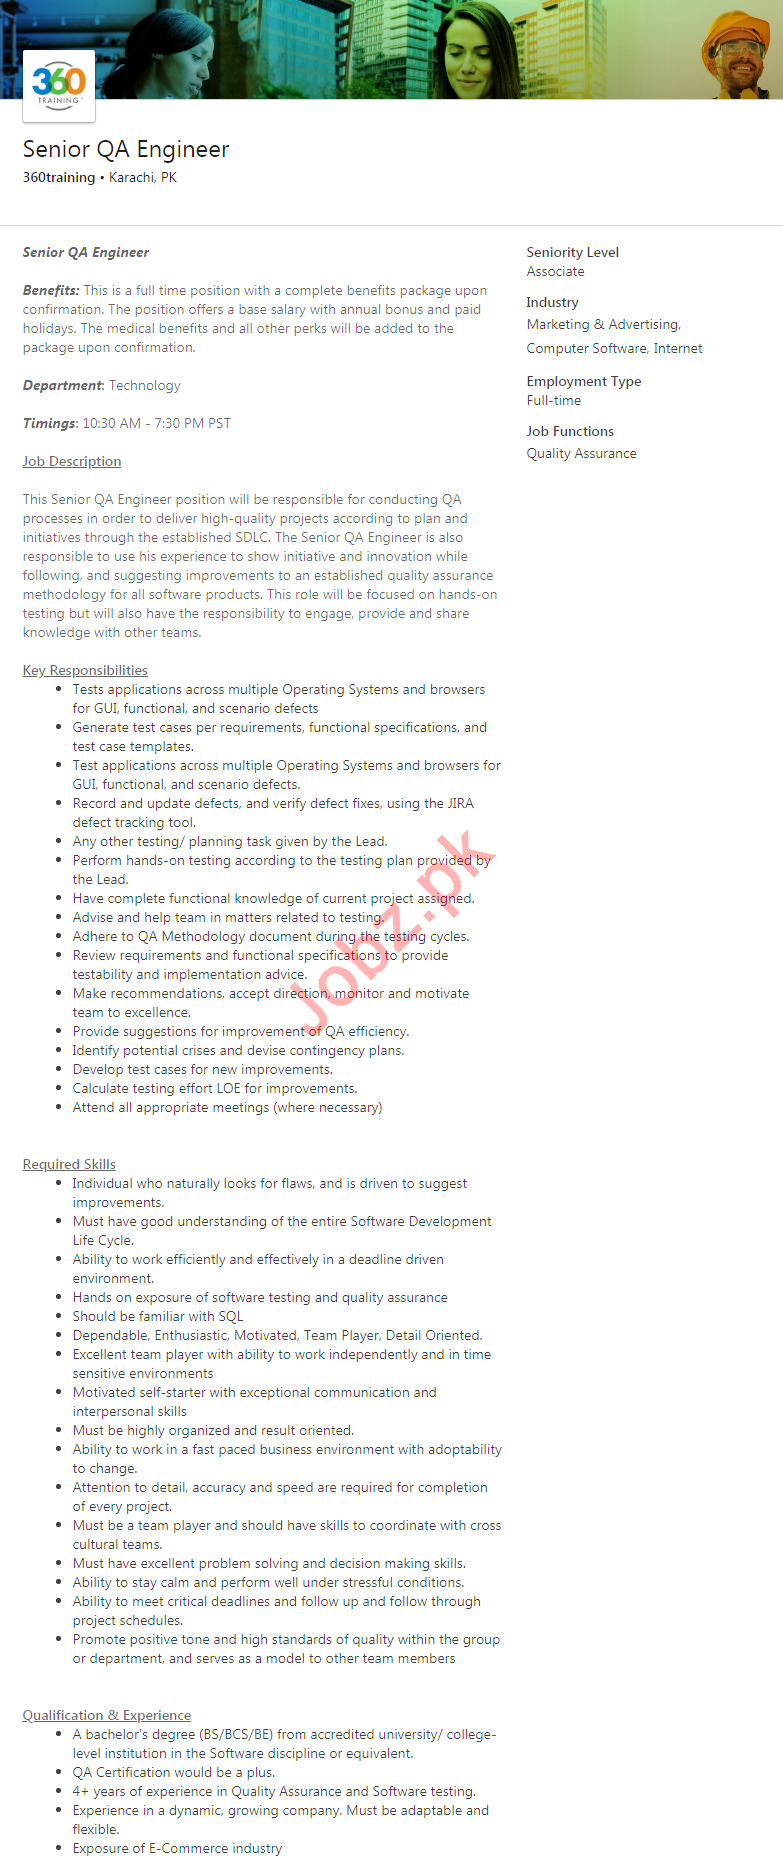 Senior Quality Assurance QA Engineer Job 2020 in Karachi